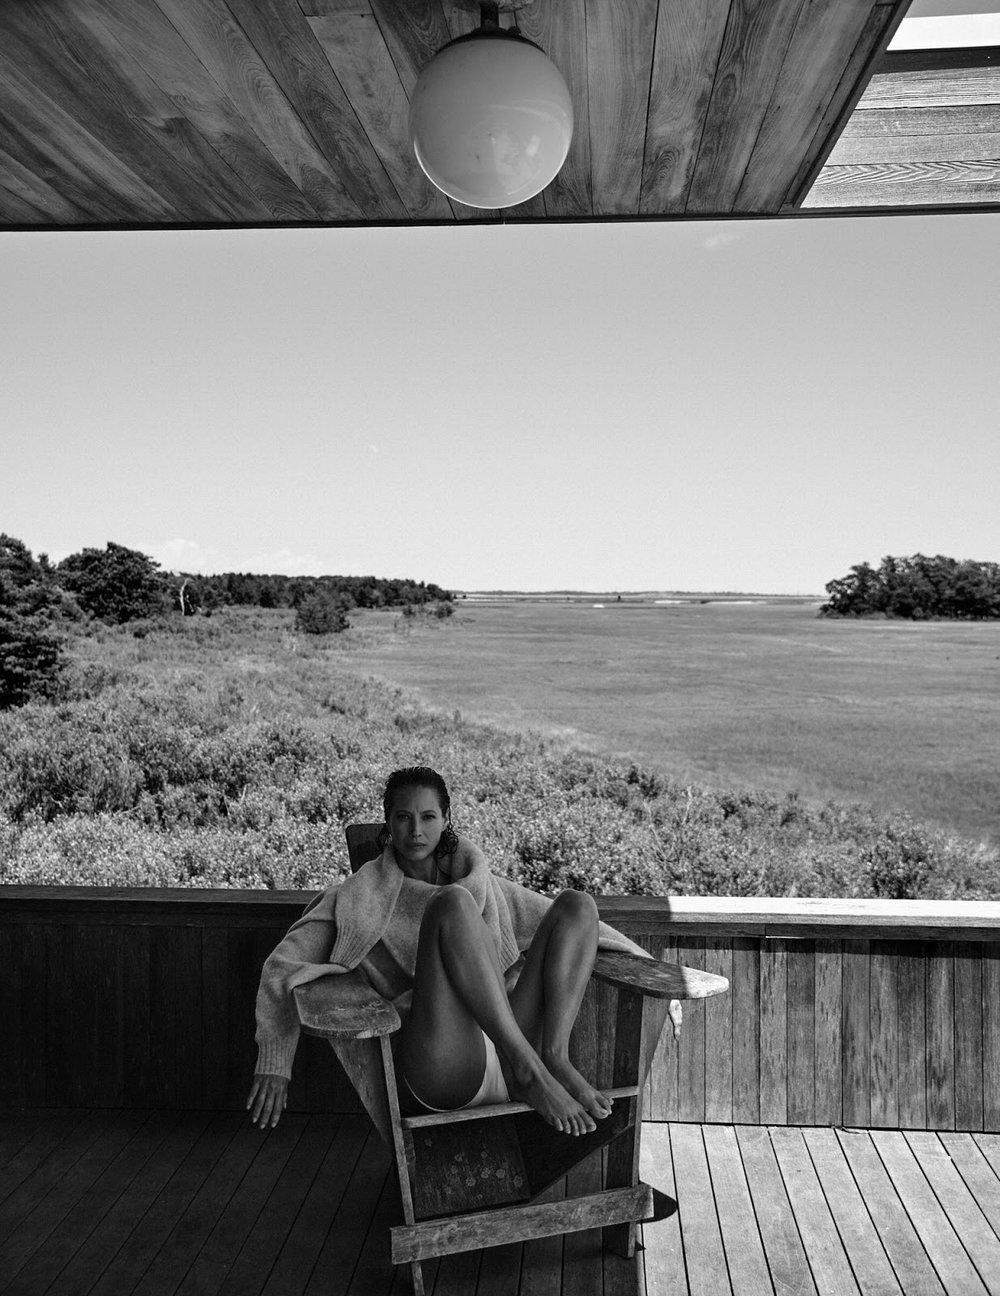 Christy Turlington by Chris Colls for Vogue Poland September 2018 (5).jpg